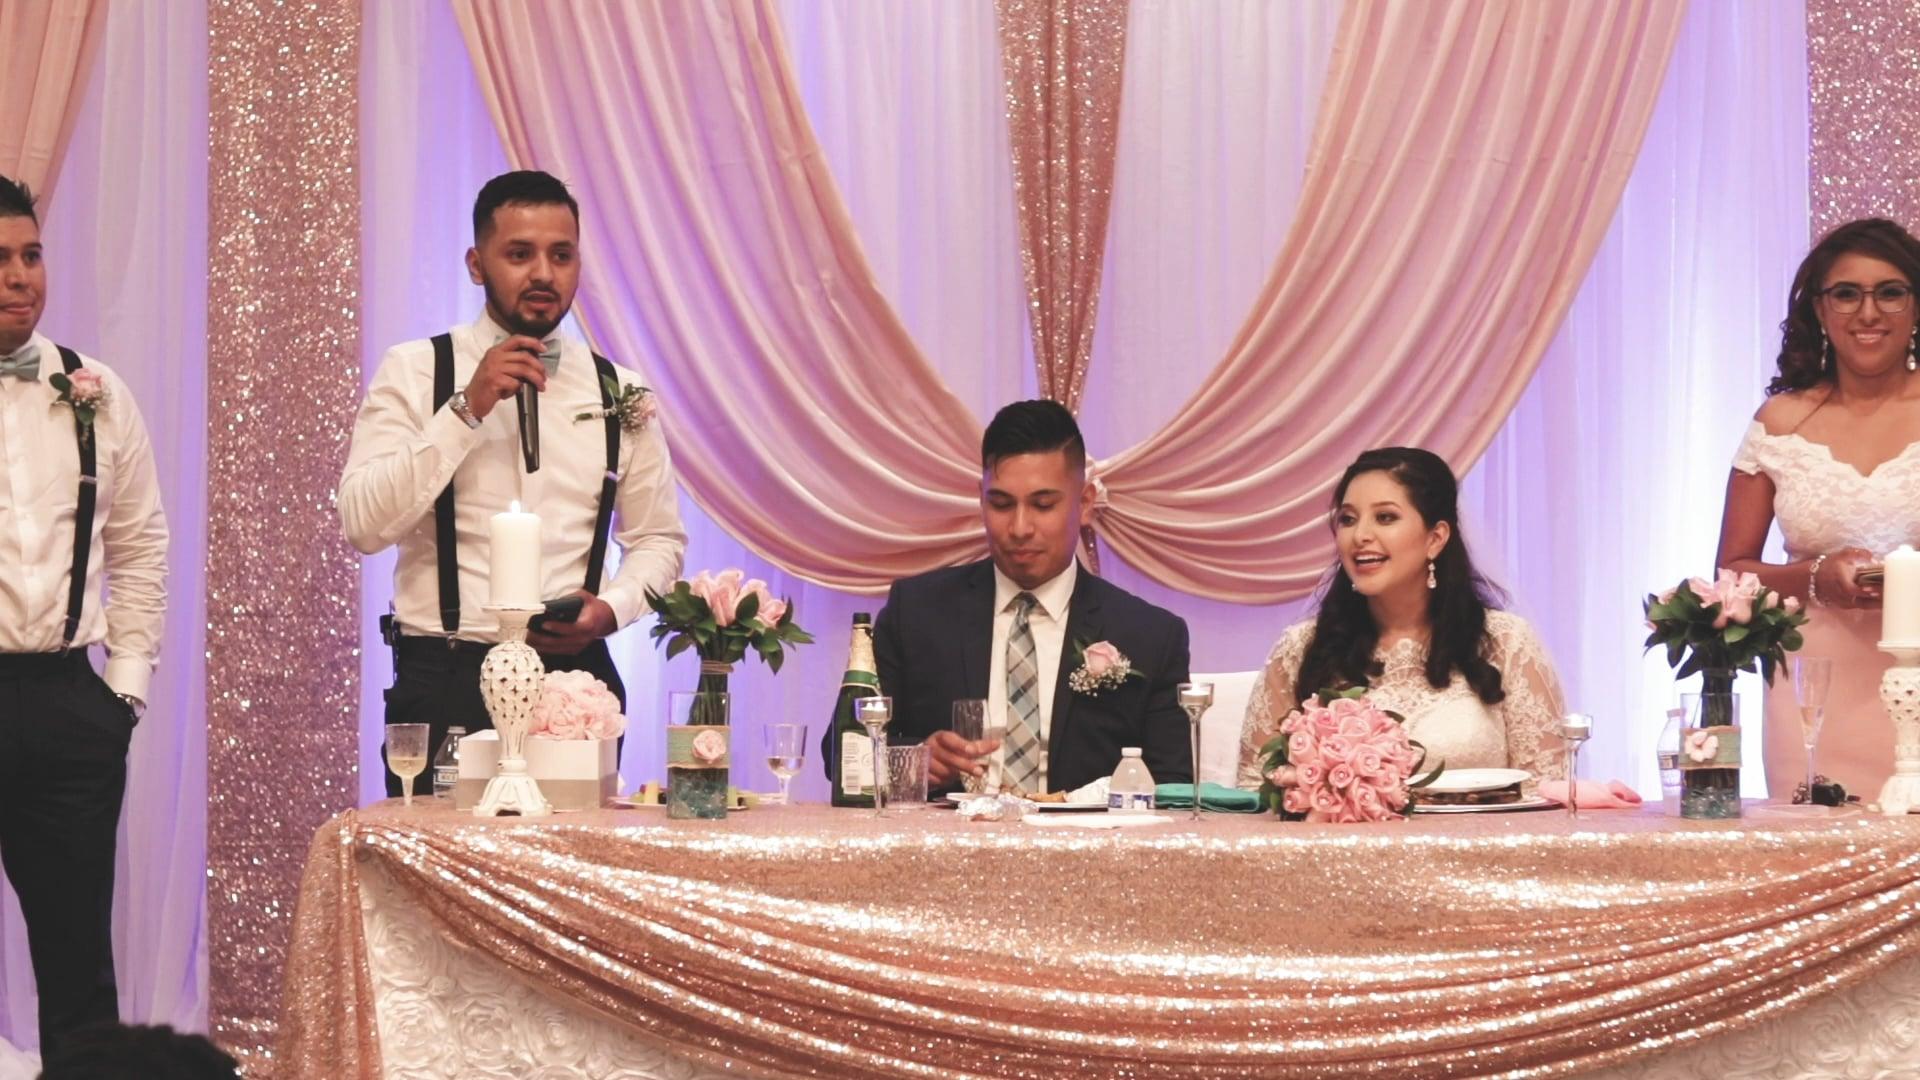 Bocanegra Wedding 2018 (Short Version)